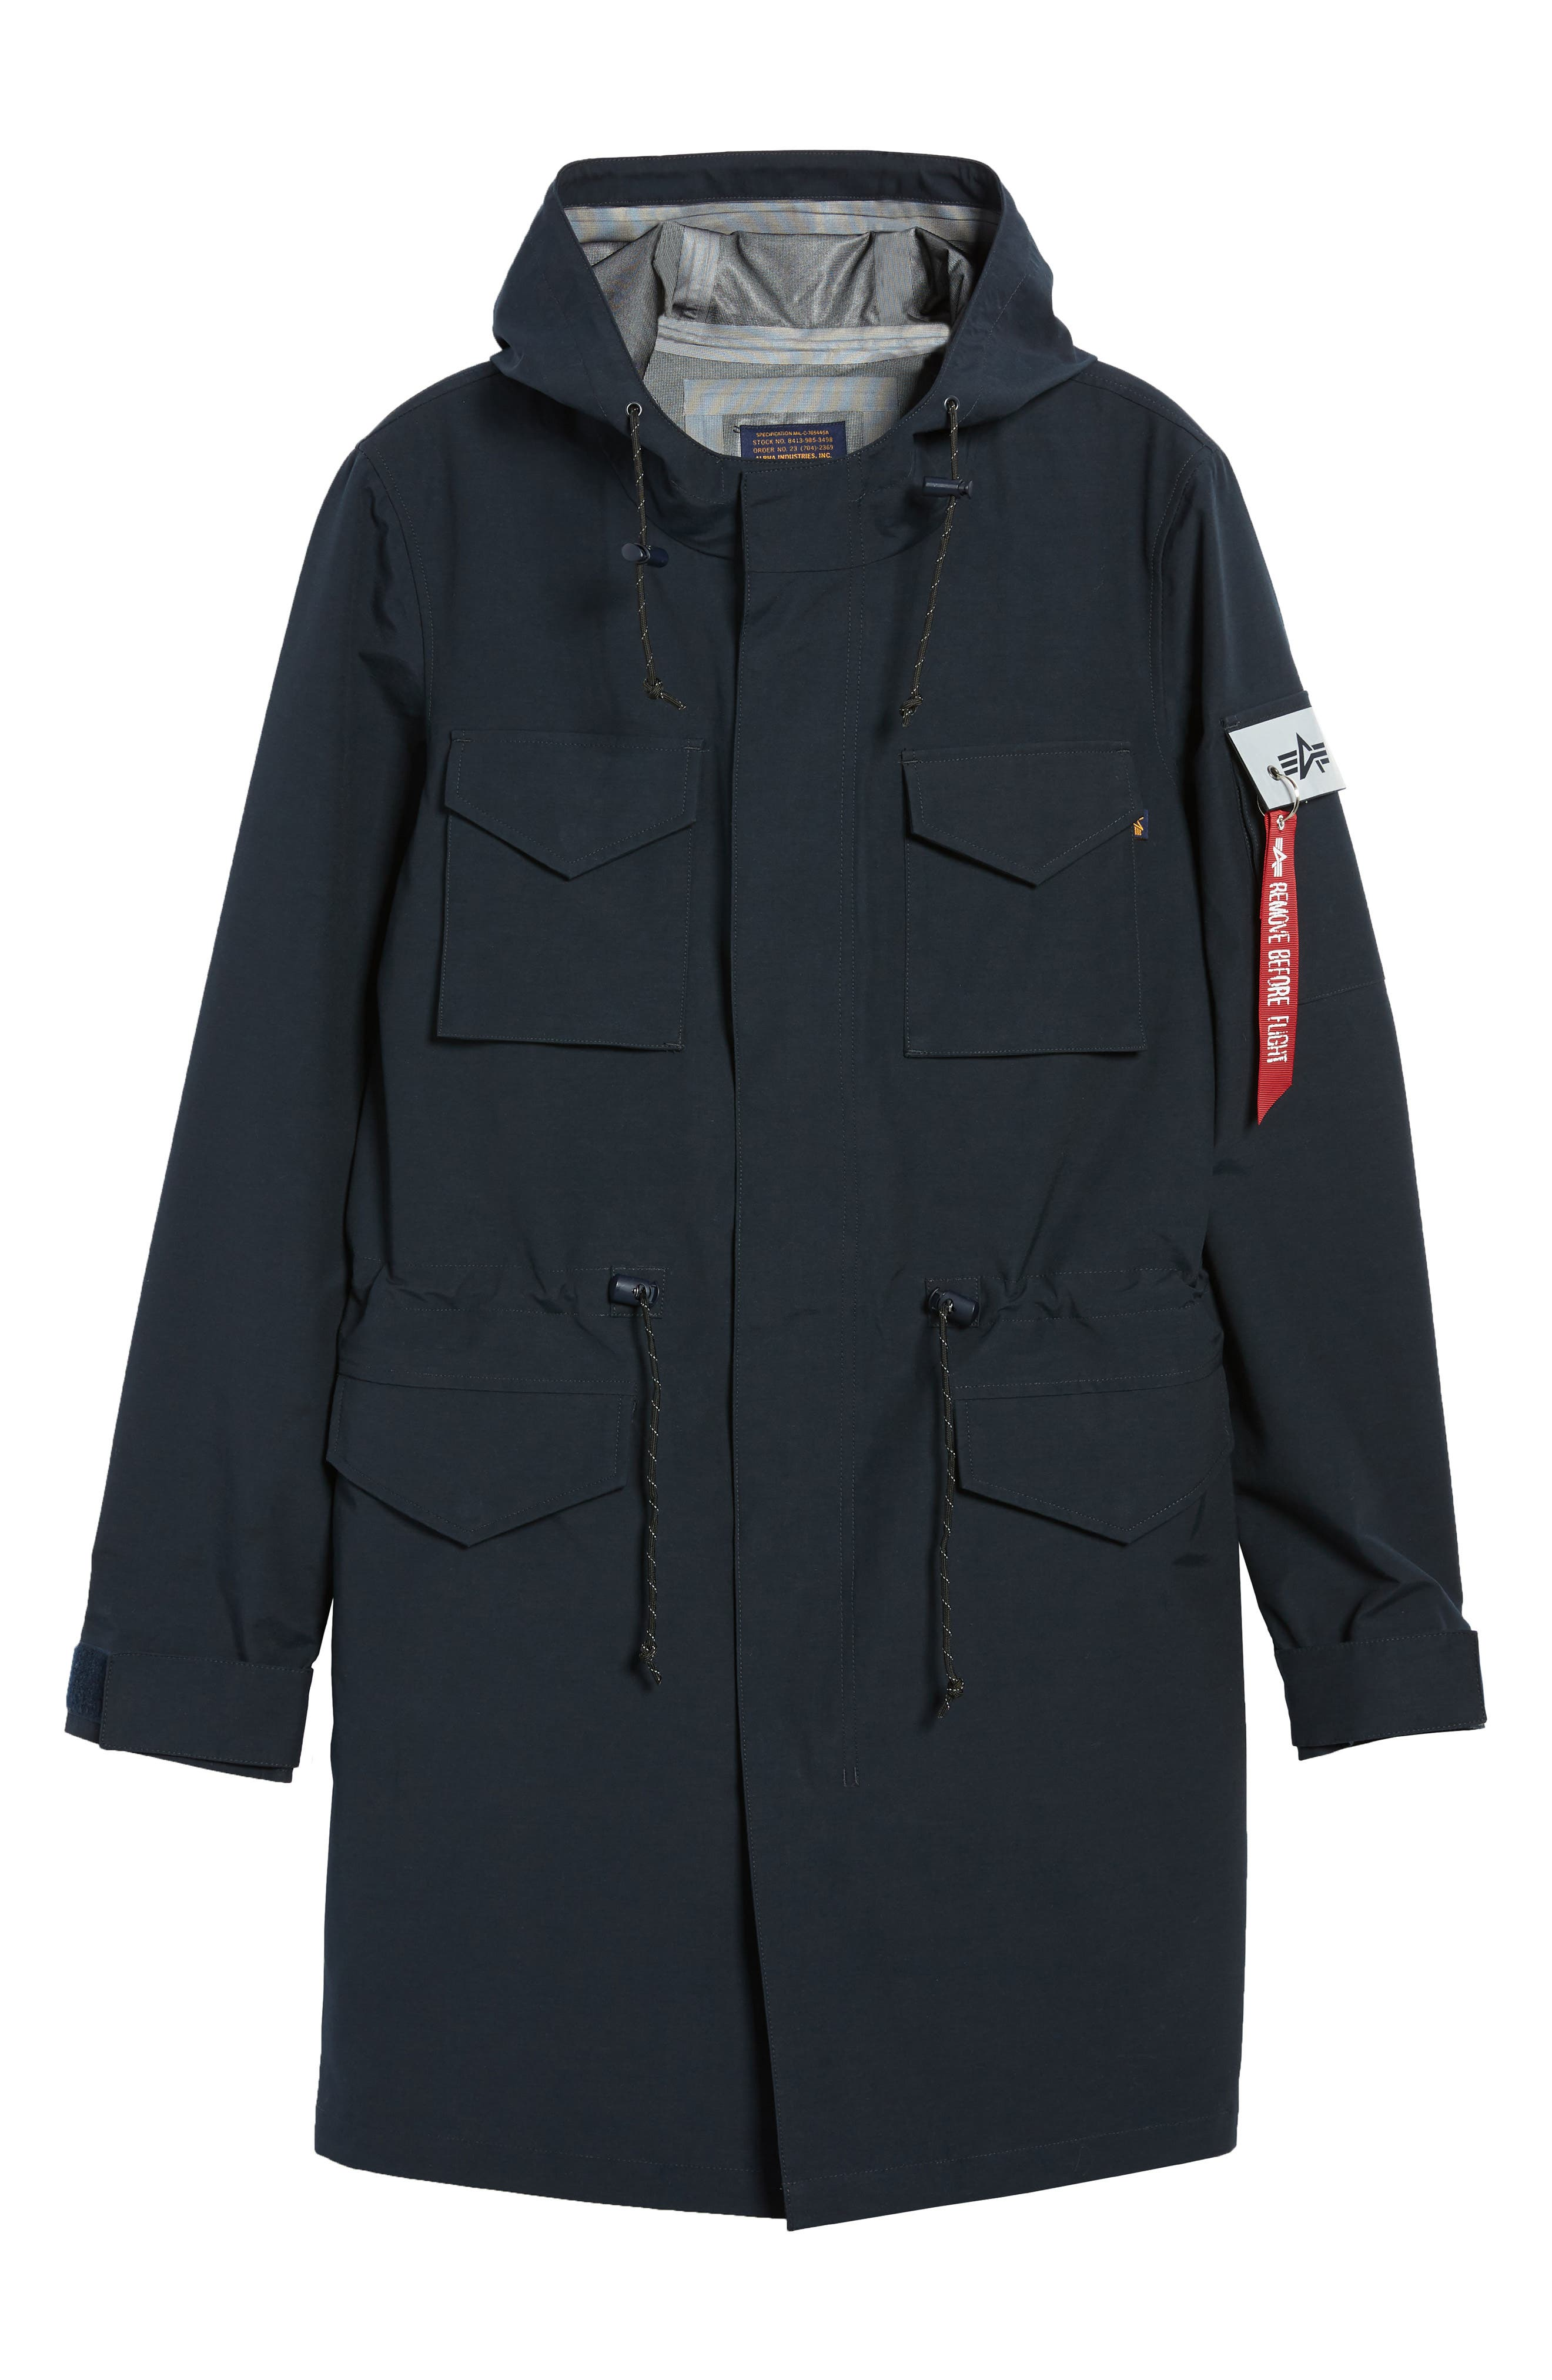 Quartermaster Waterproof Field Coat,                             Alternate thumbnail 5, color,                             410